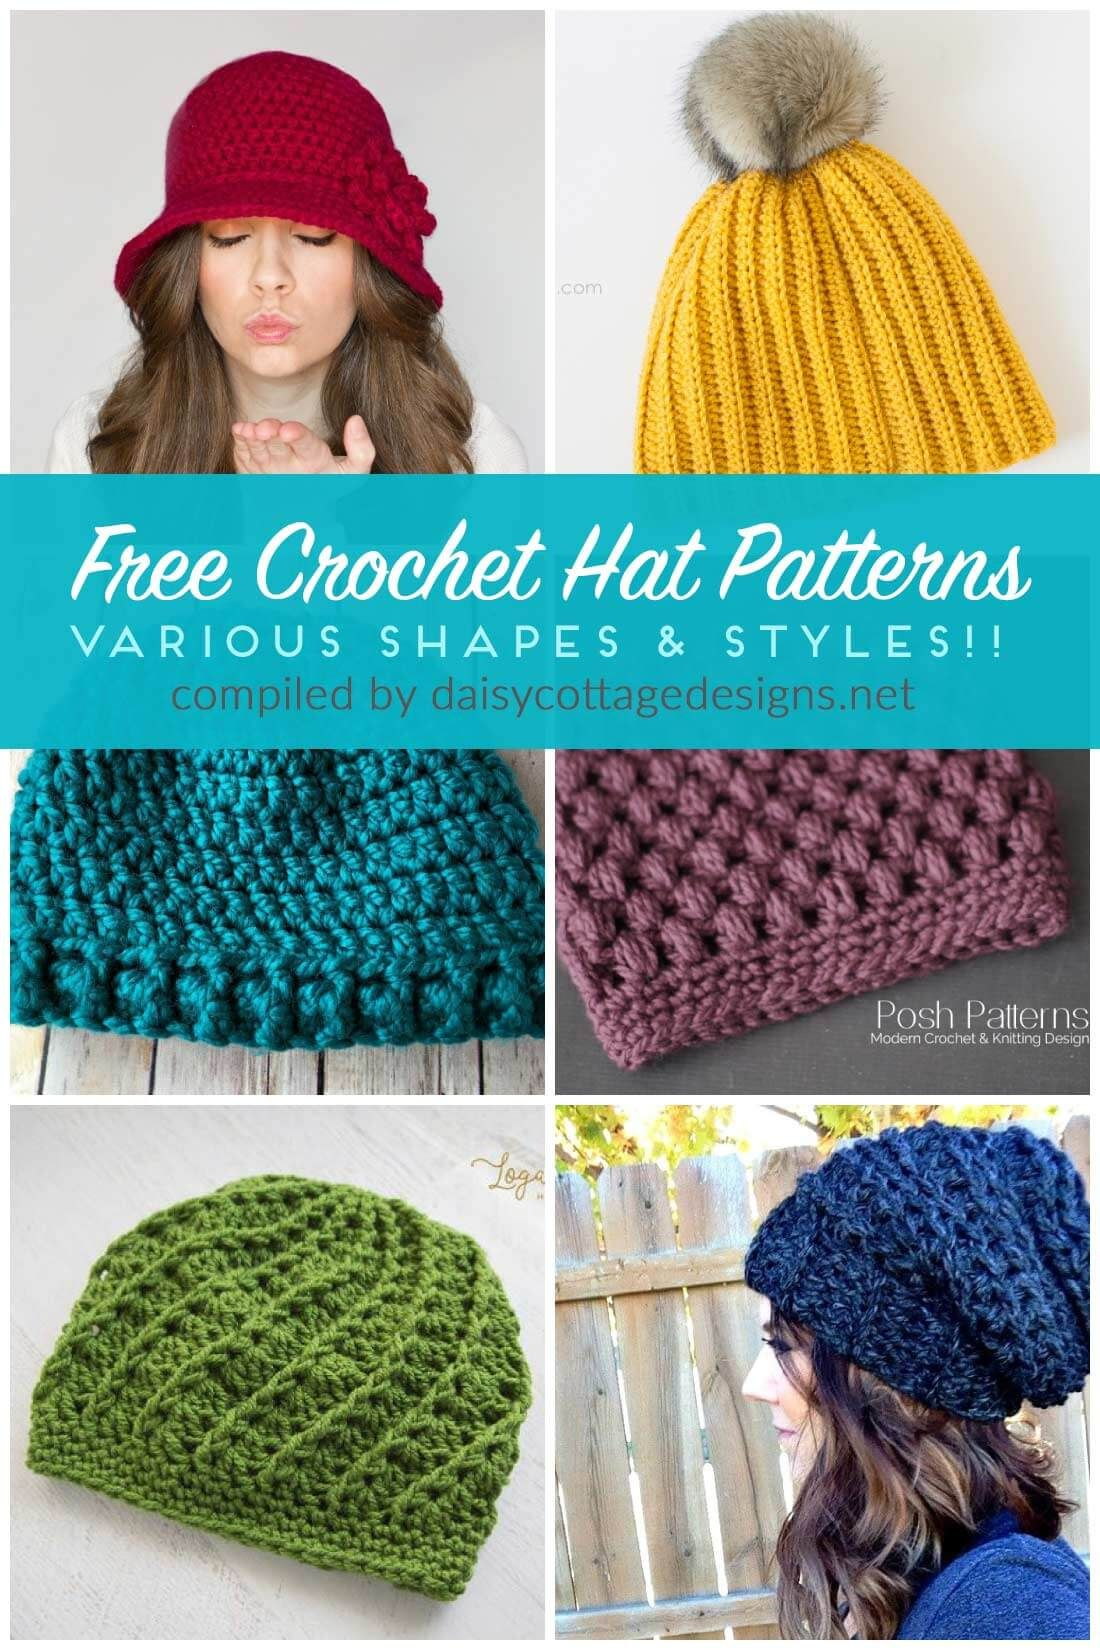 Free Crochet Hat Patterns   Free crochet hat patterns, Cottage ...